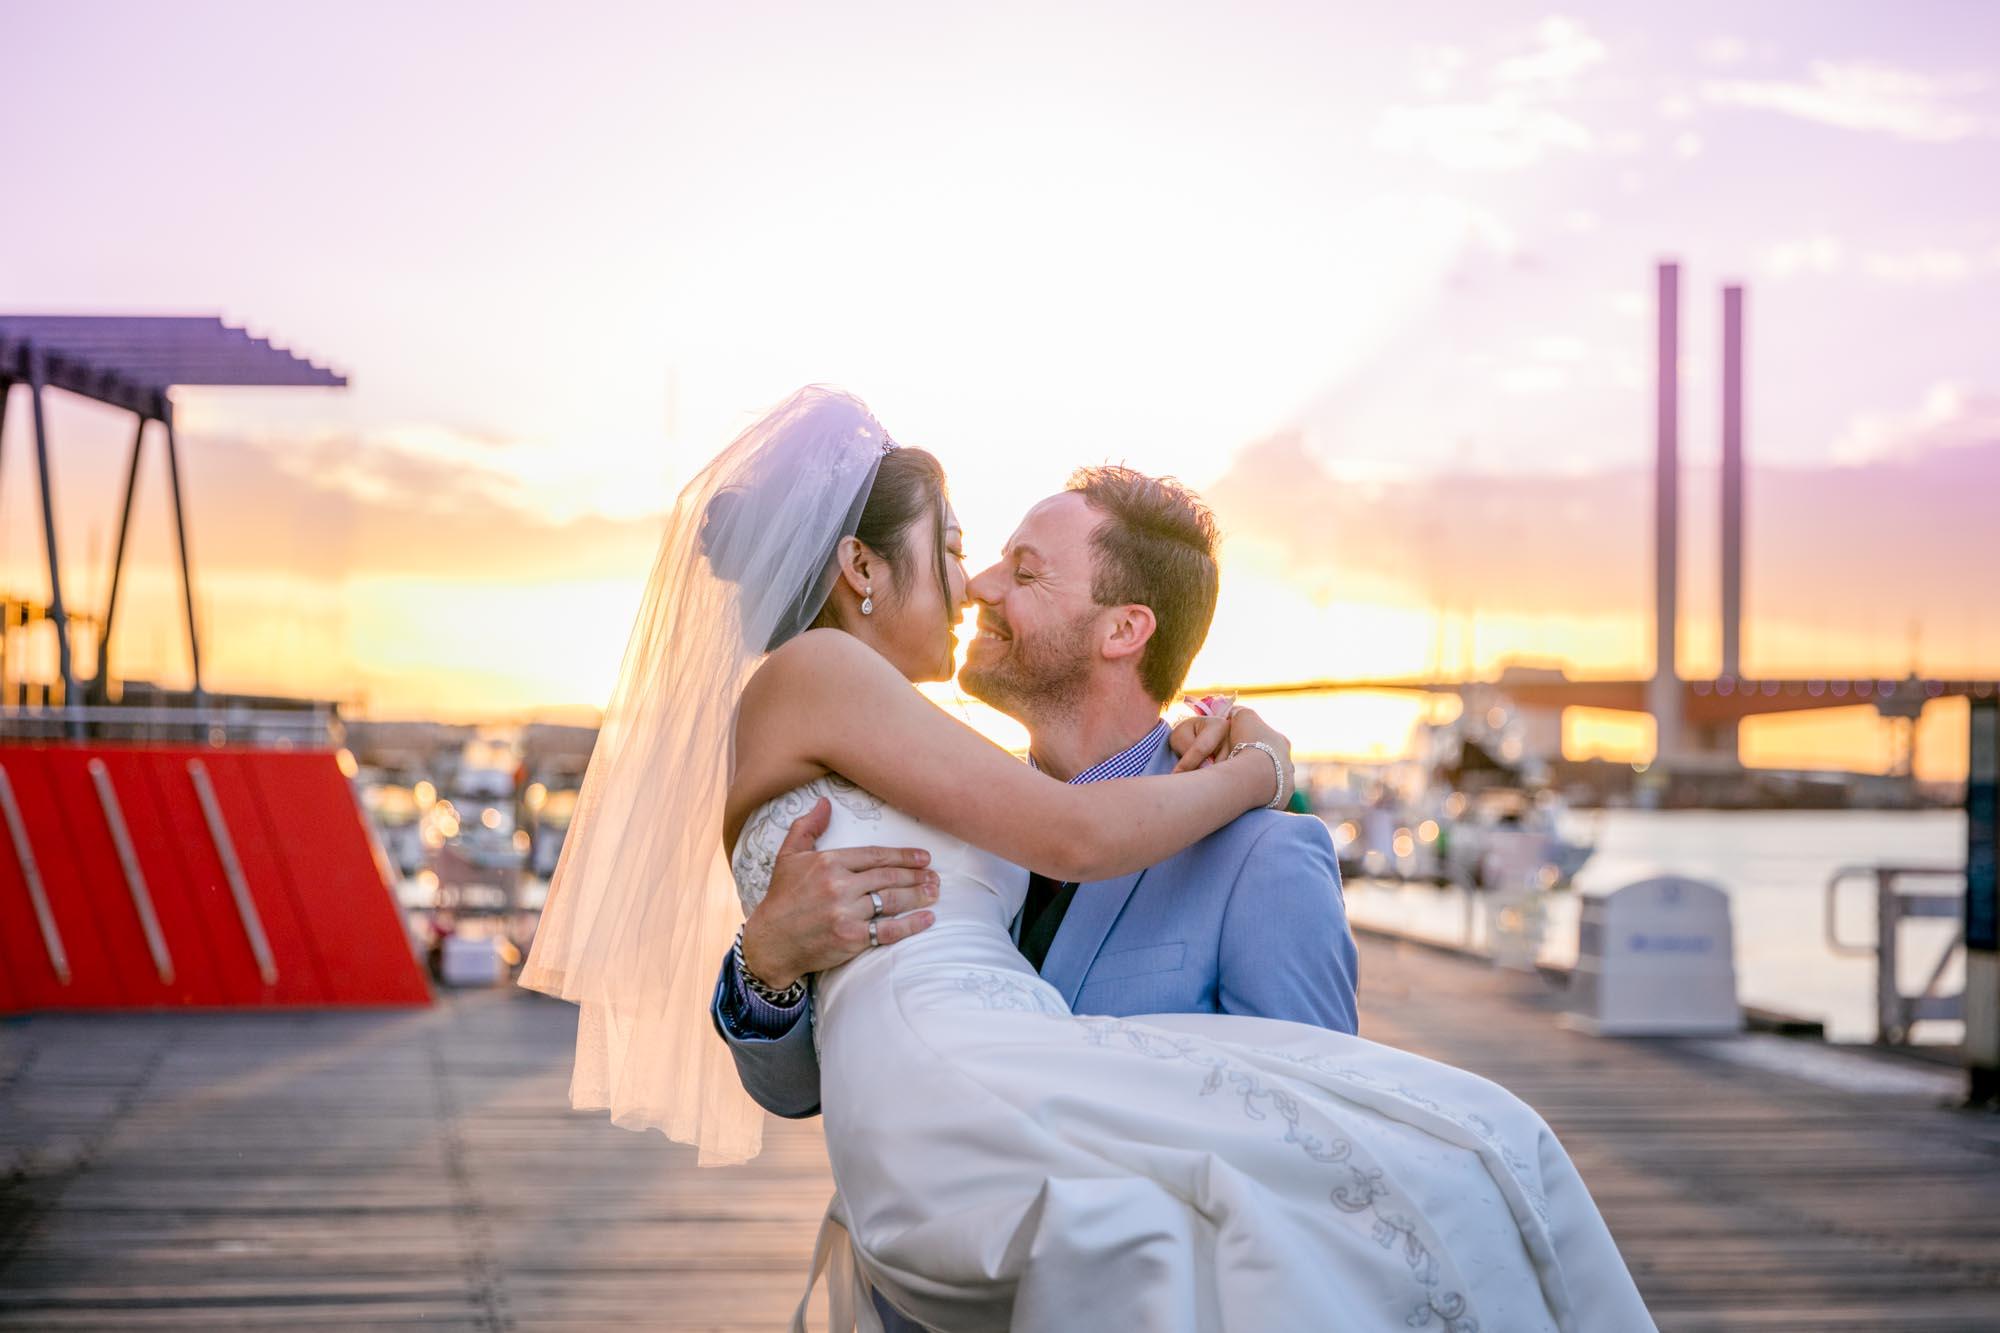 ©Sherman Tan Studio_Melbourne Wedding Photographer_Best Portrait Locations_Jarrod and Sylvia 5d-0803-2.jpg